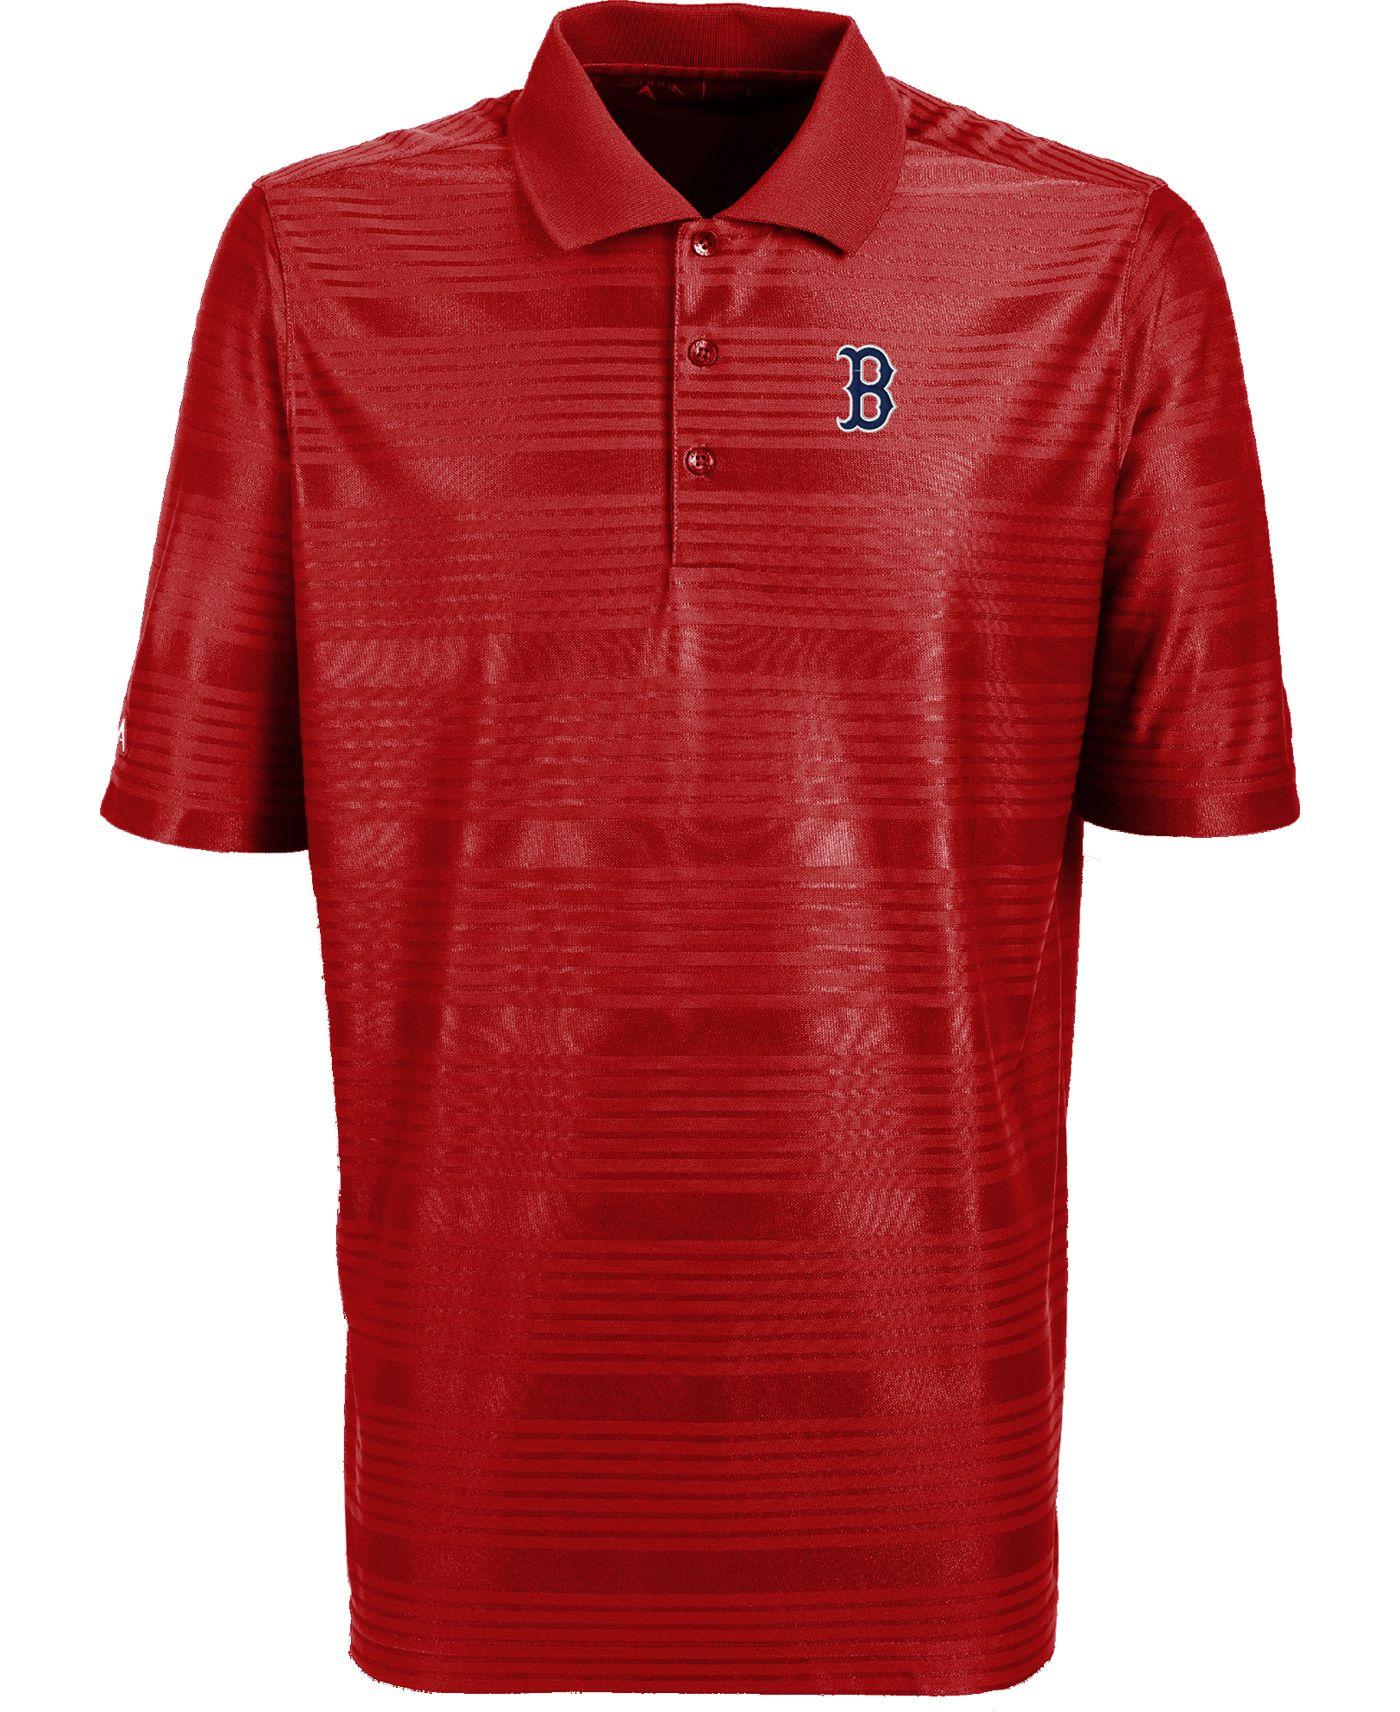 Antigua Men's Boston Red Sox Illusion Red Striped Performance Polo